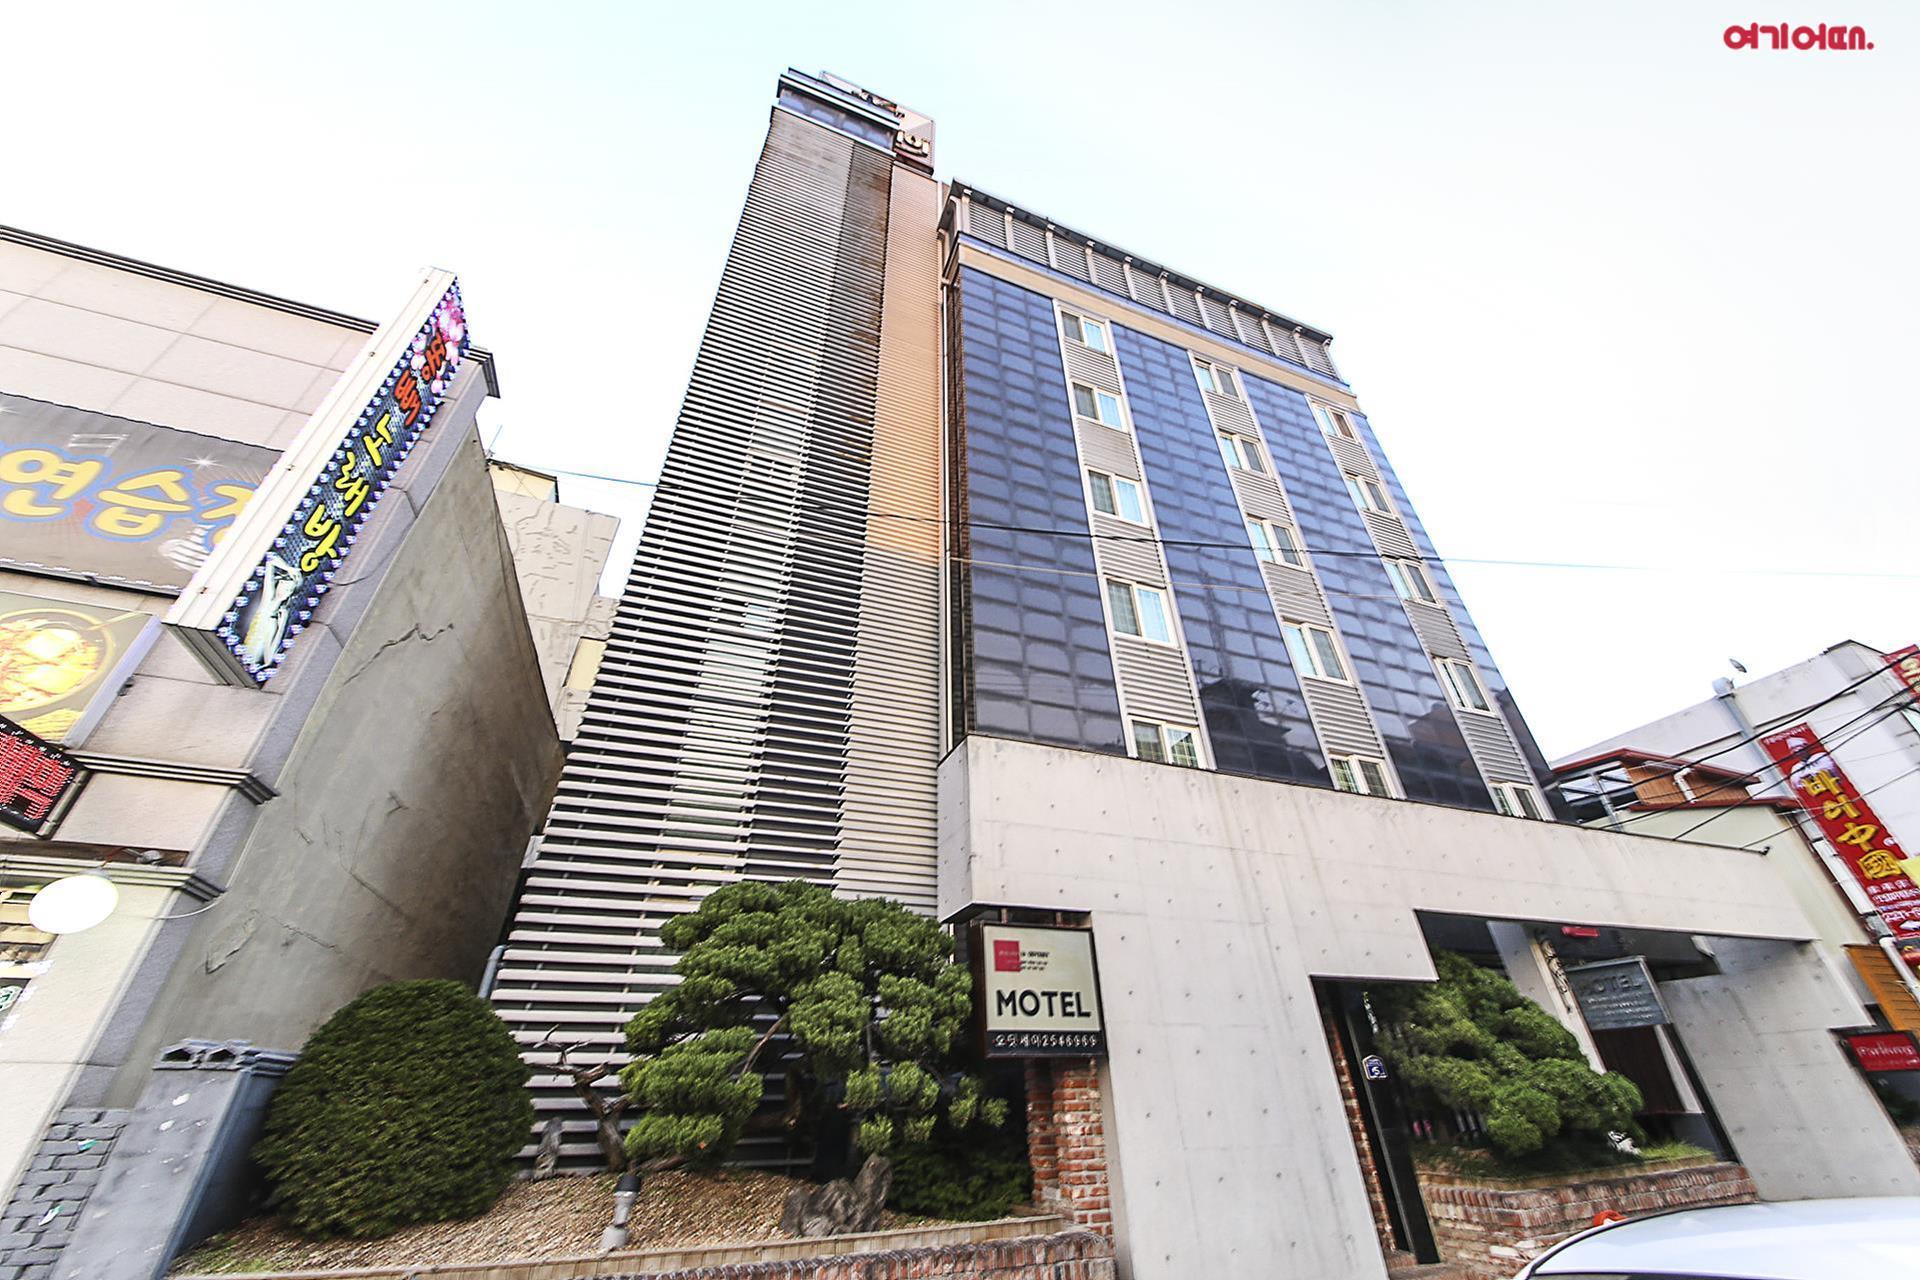 Odyssey Motel Cheongju